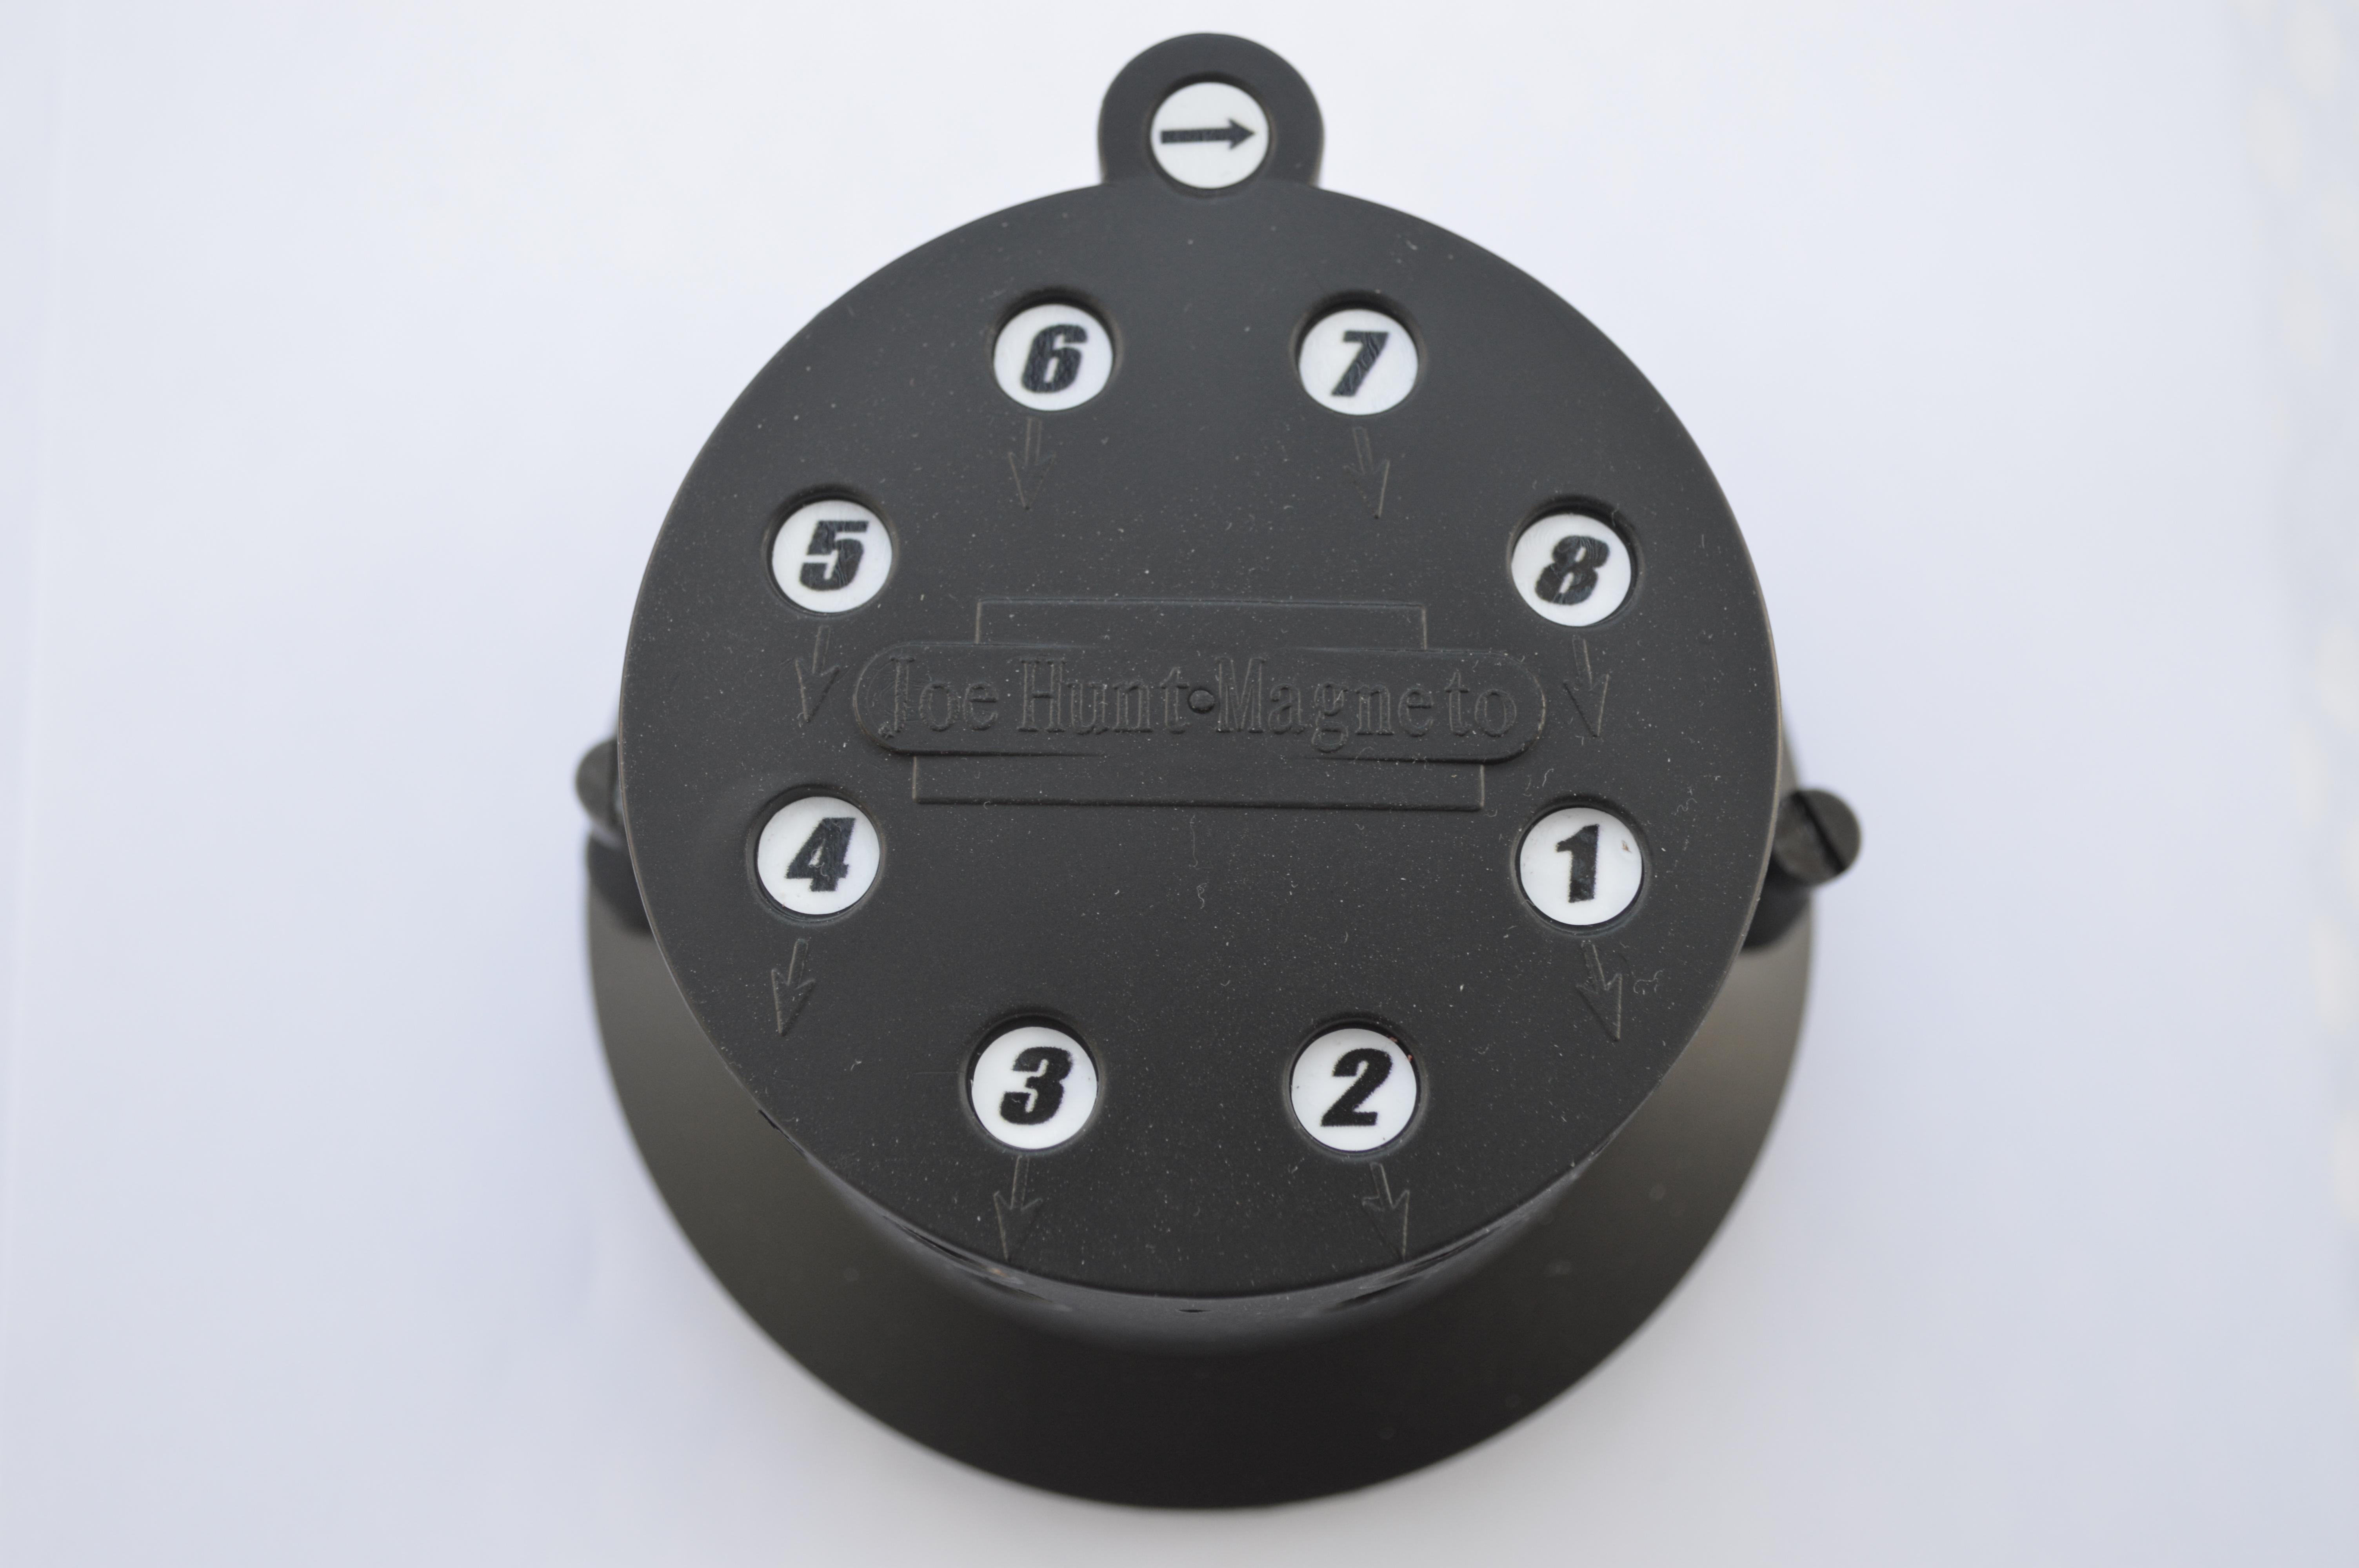 Vertex Magneto Cap Wiring Diagram - Electrical Work Wiring Diagram •